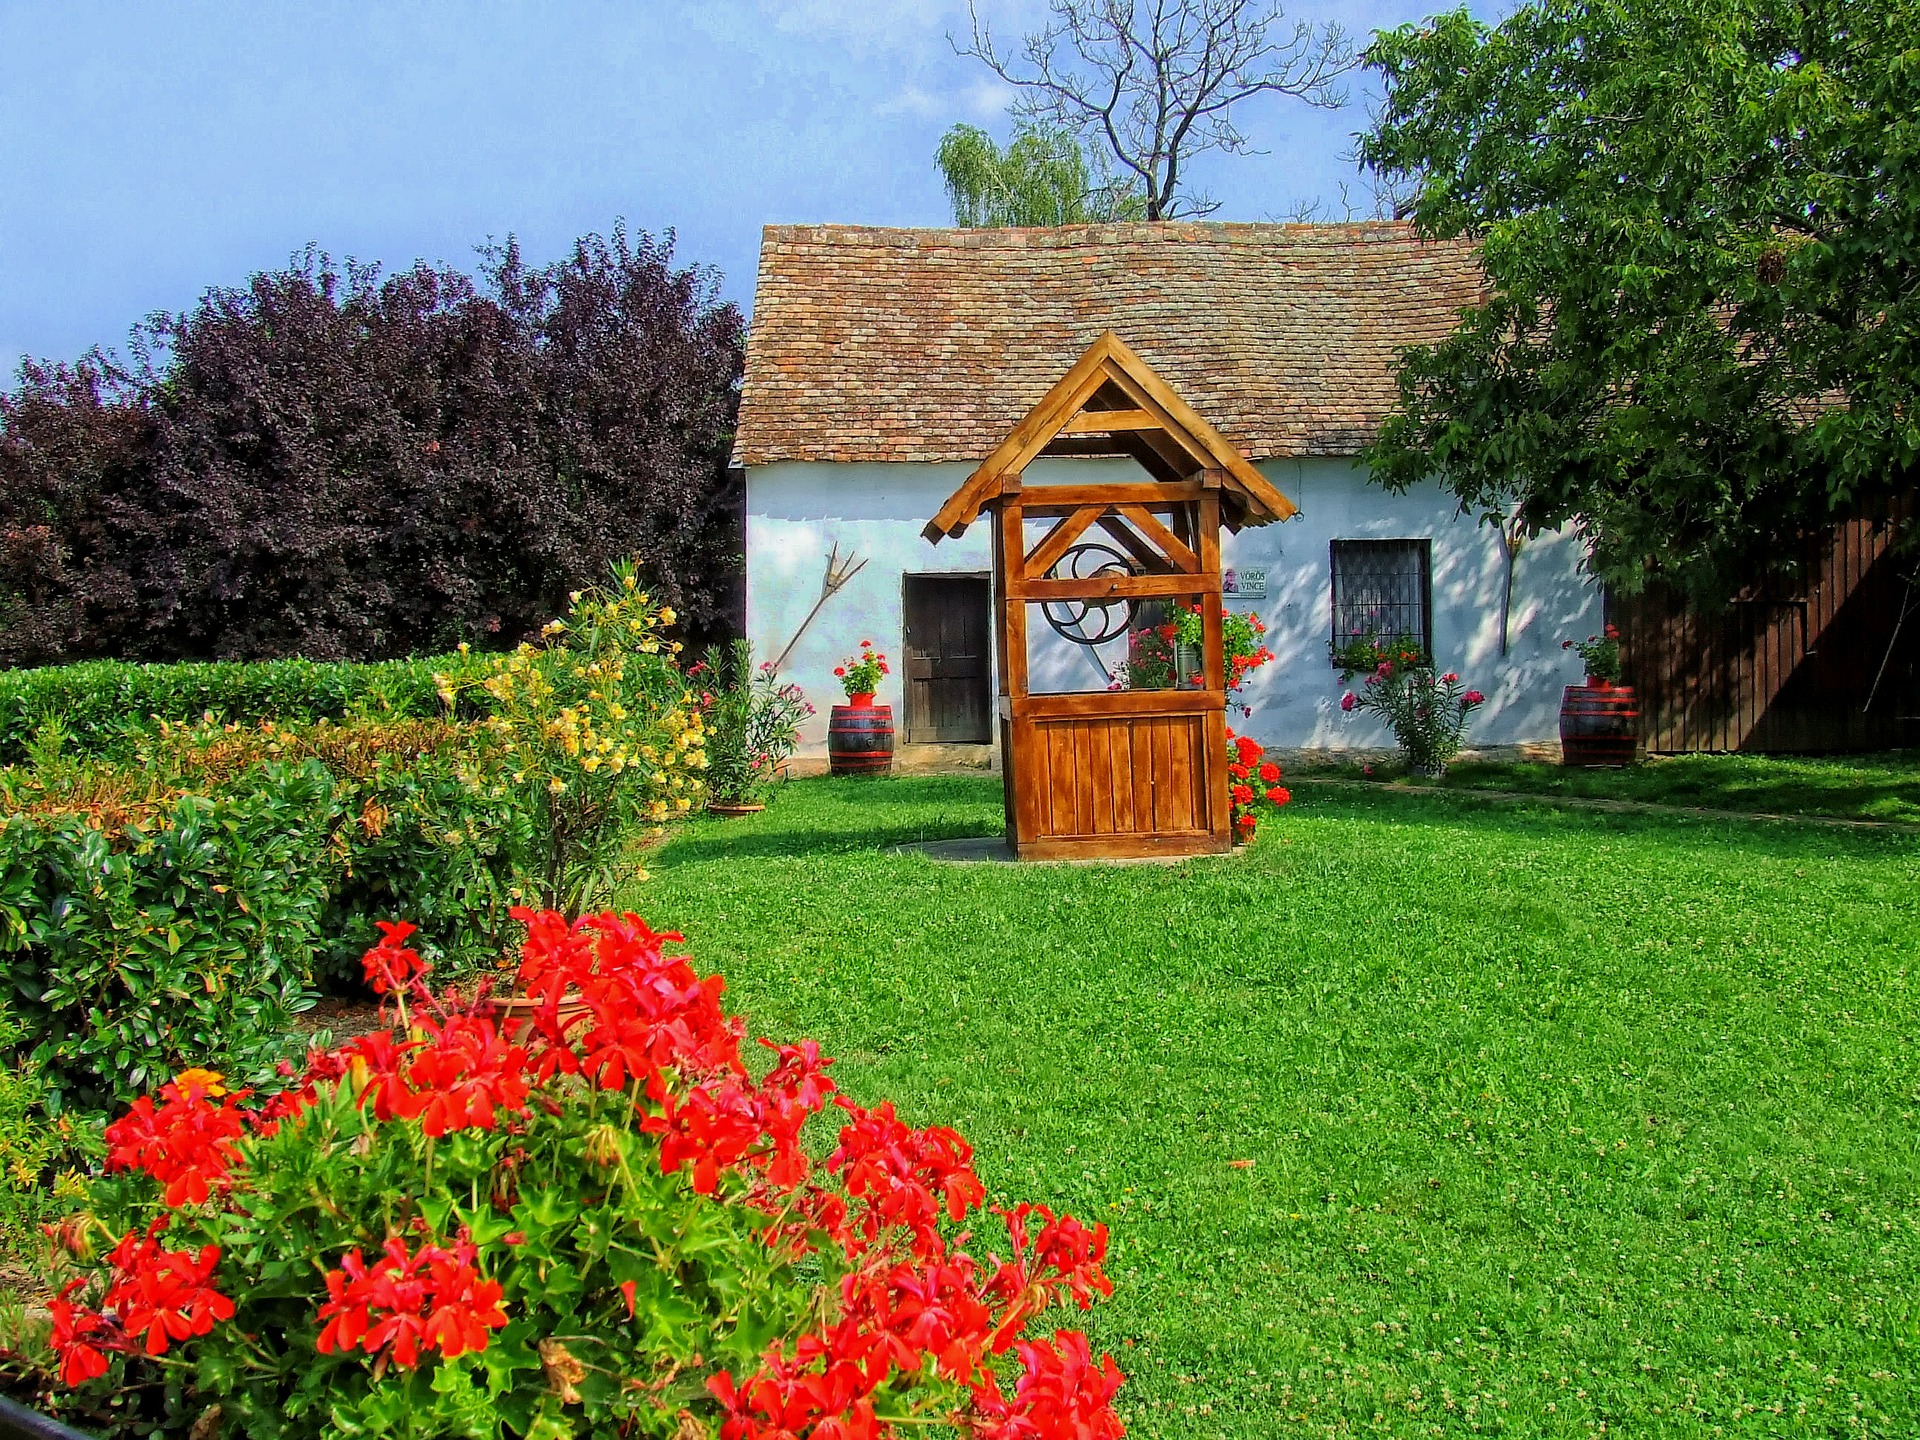 Rasen, Tschechische Republik, Hdr, Haus